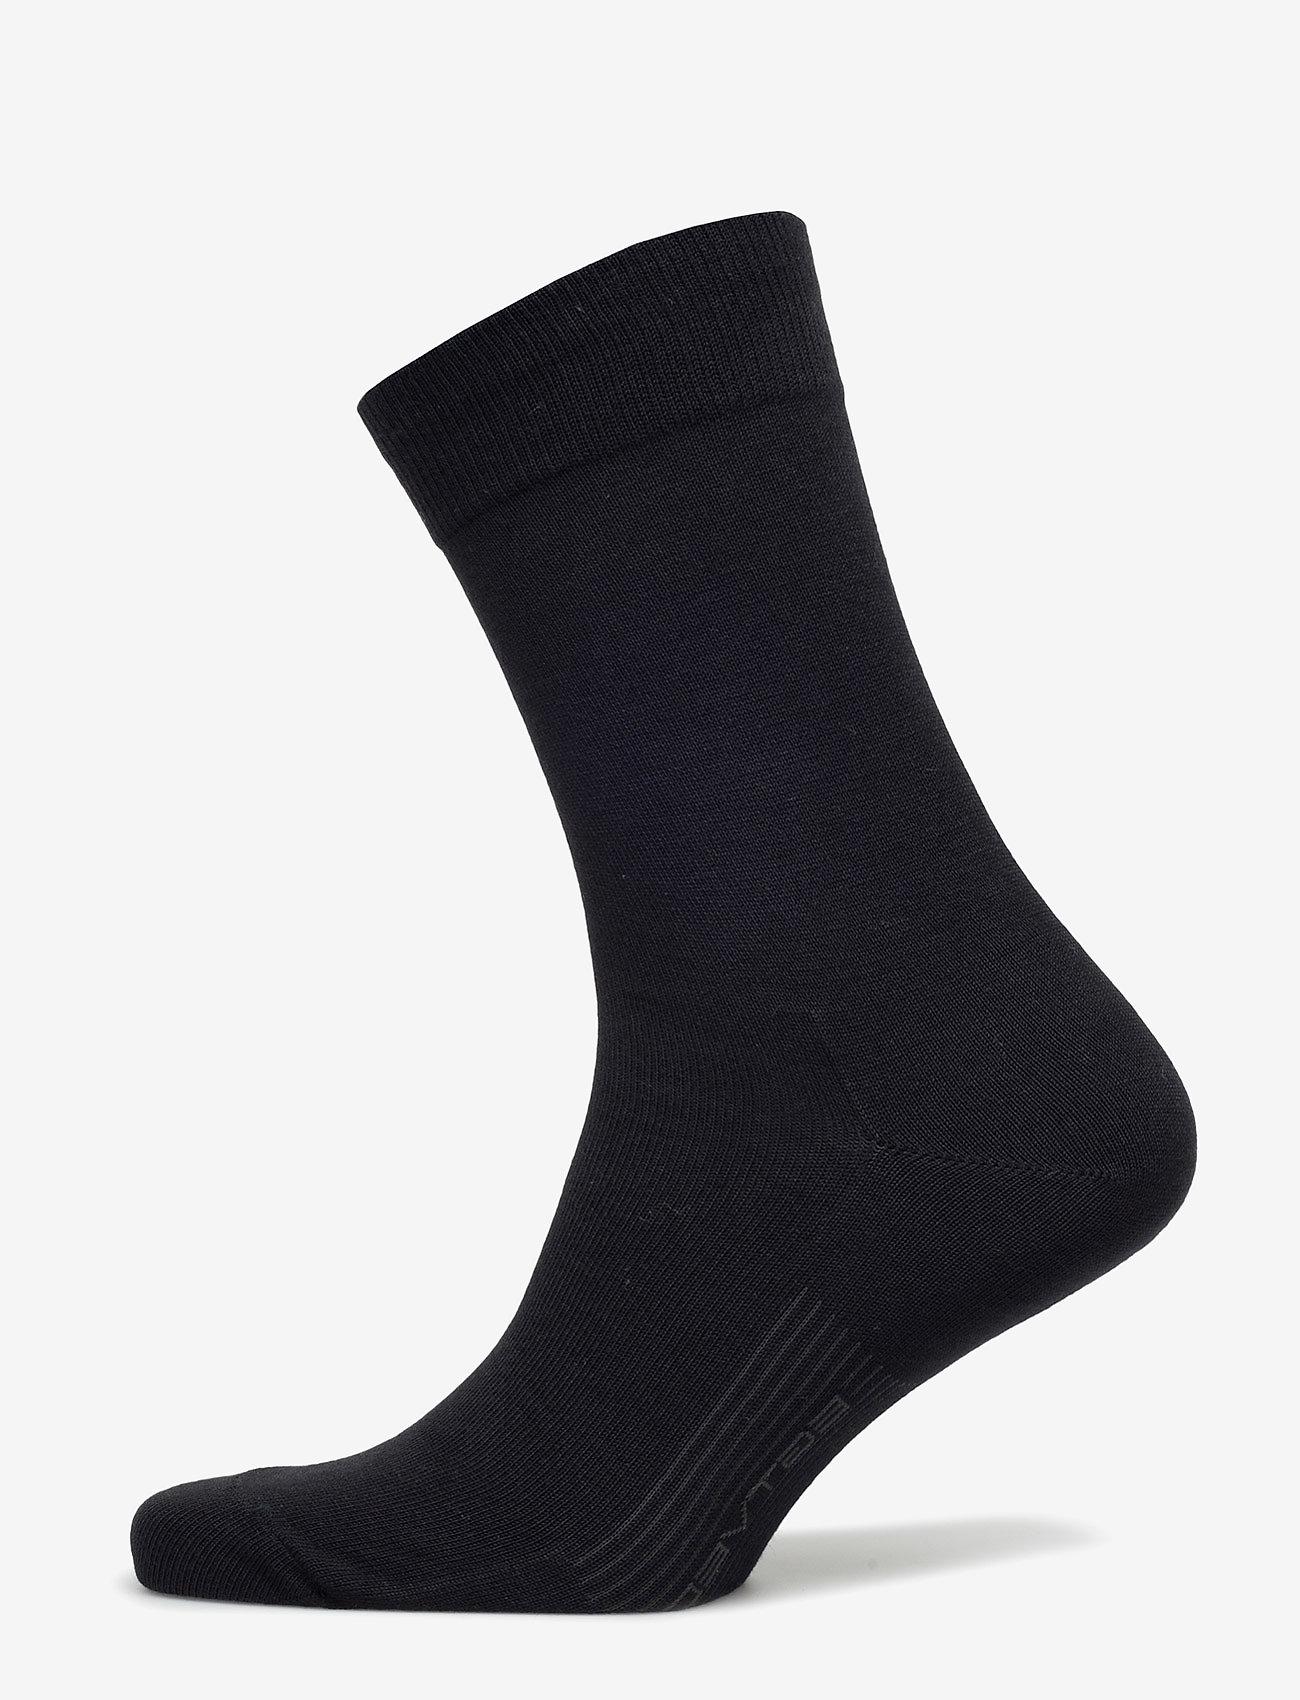 Egtved - Egtved business socks - reguläre strümpfe - black - 0